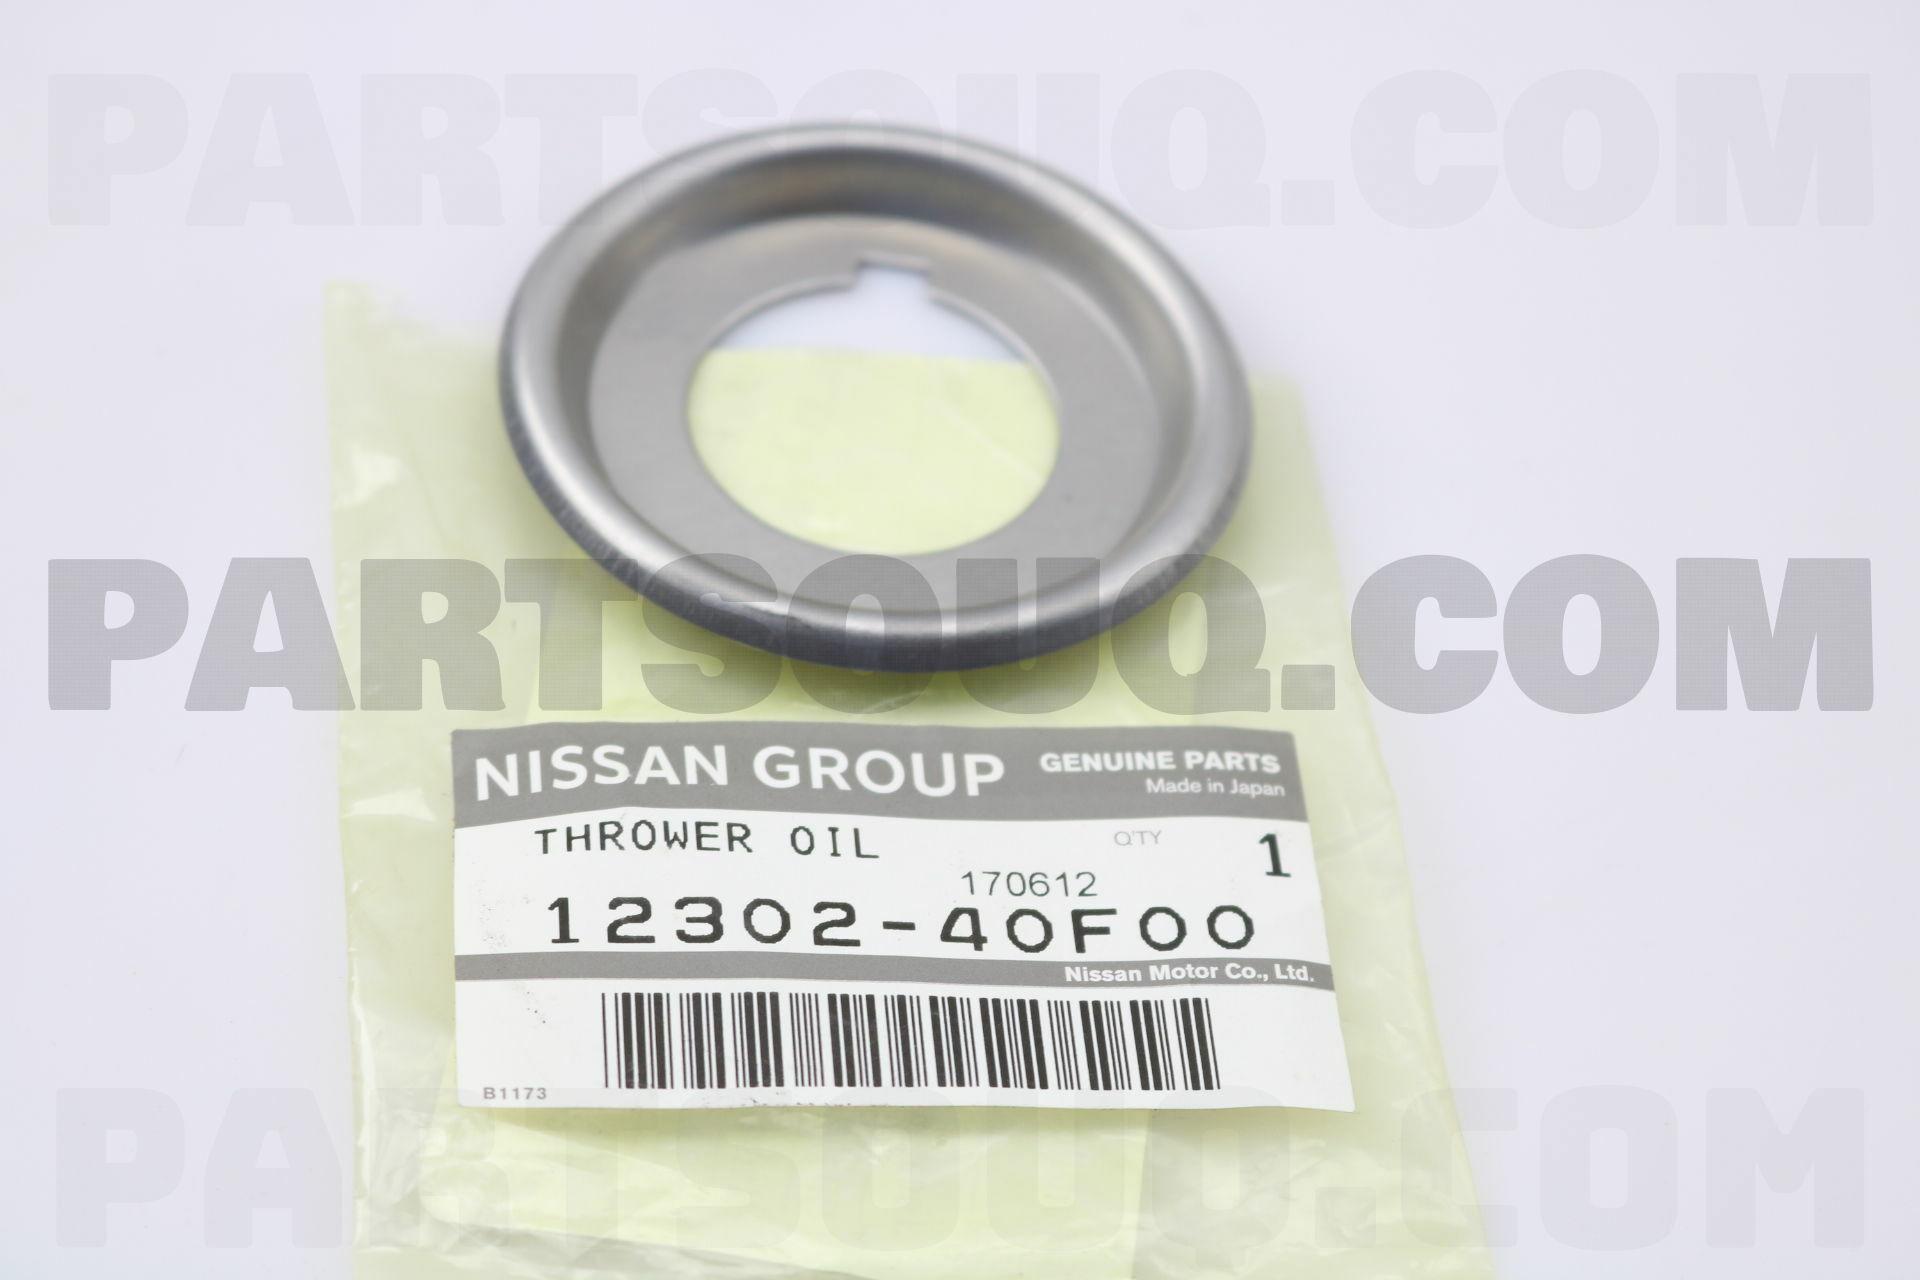 1230240F00 Nissan THROWER-OIL,CRANKSHAFT Price: 1 81